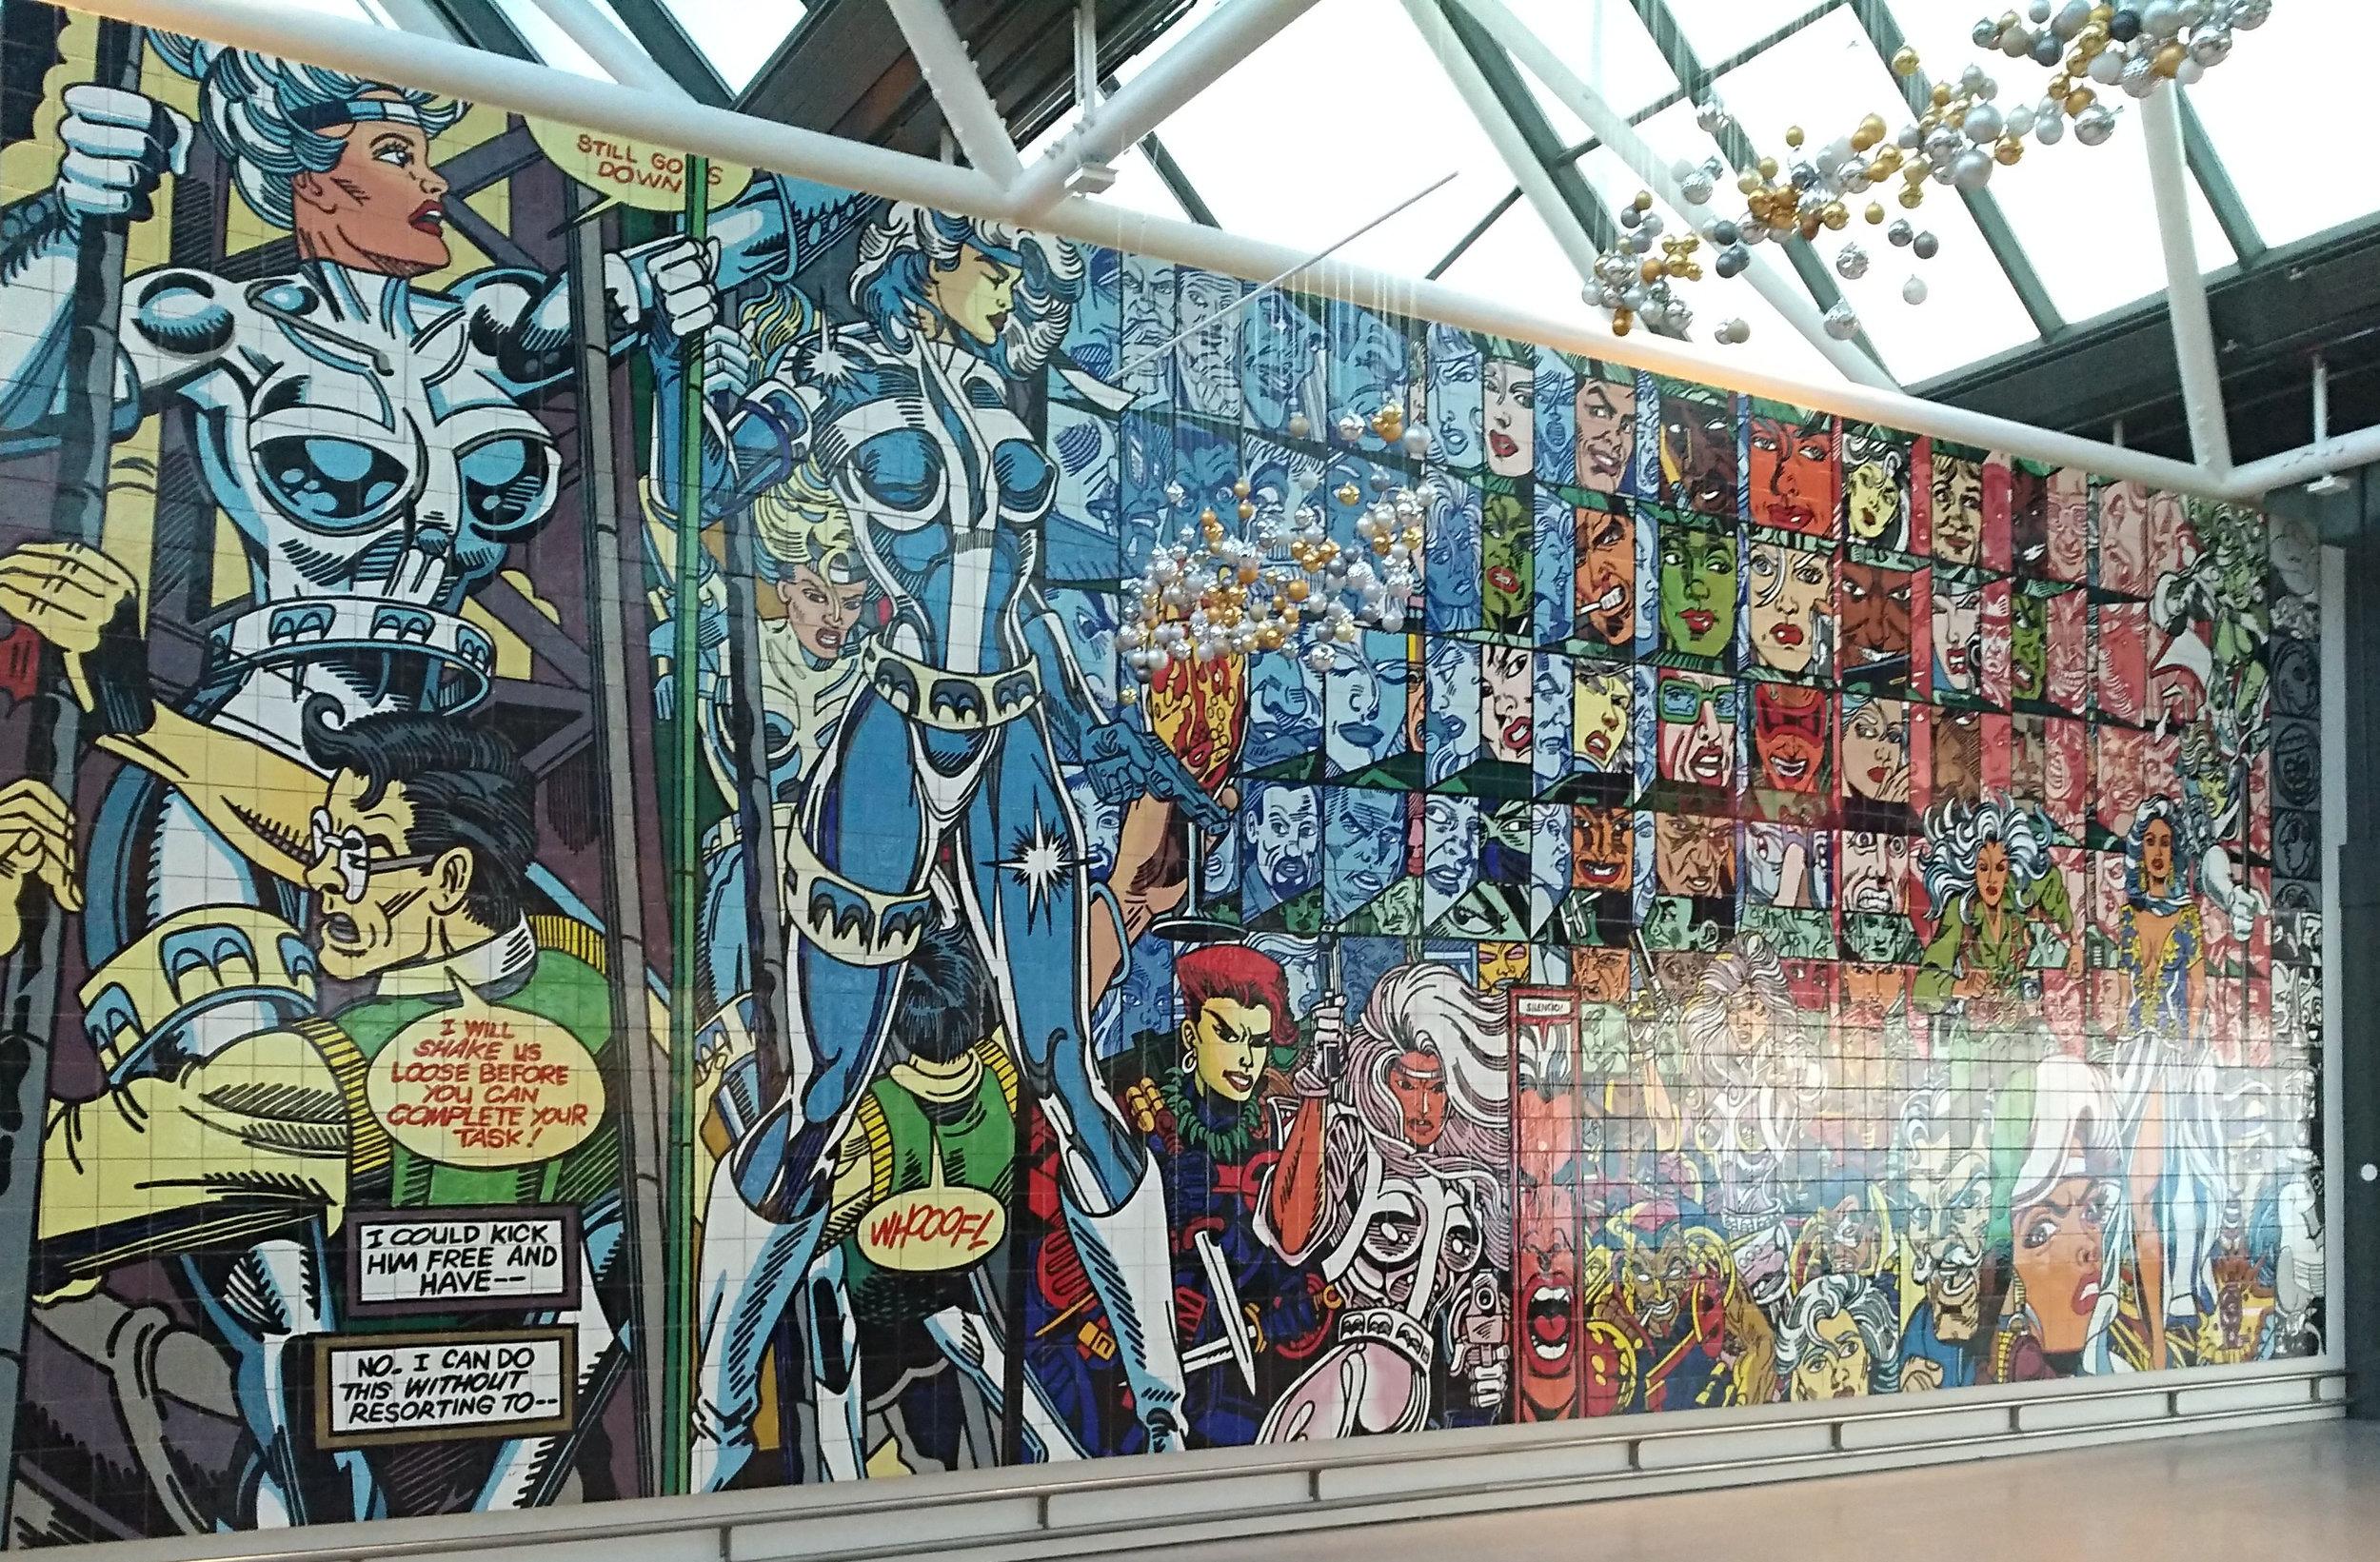 x-men-storm-mural-reykjavik-iceland.jpg